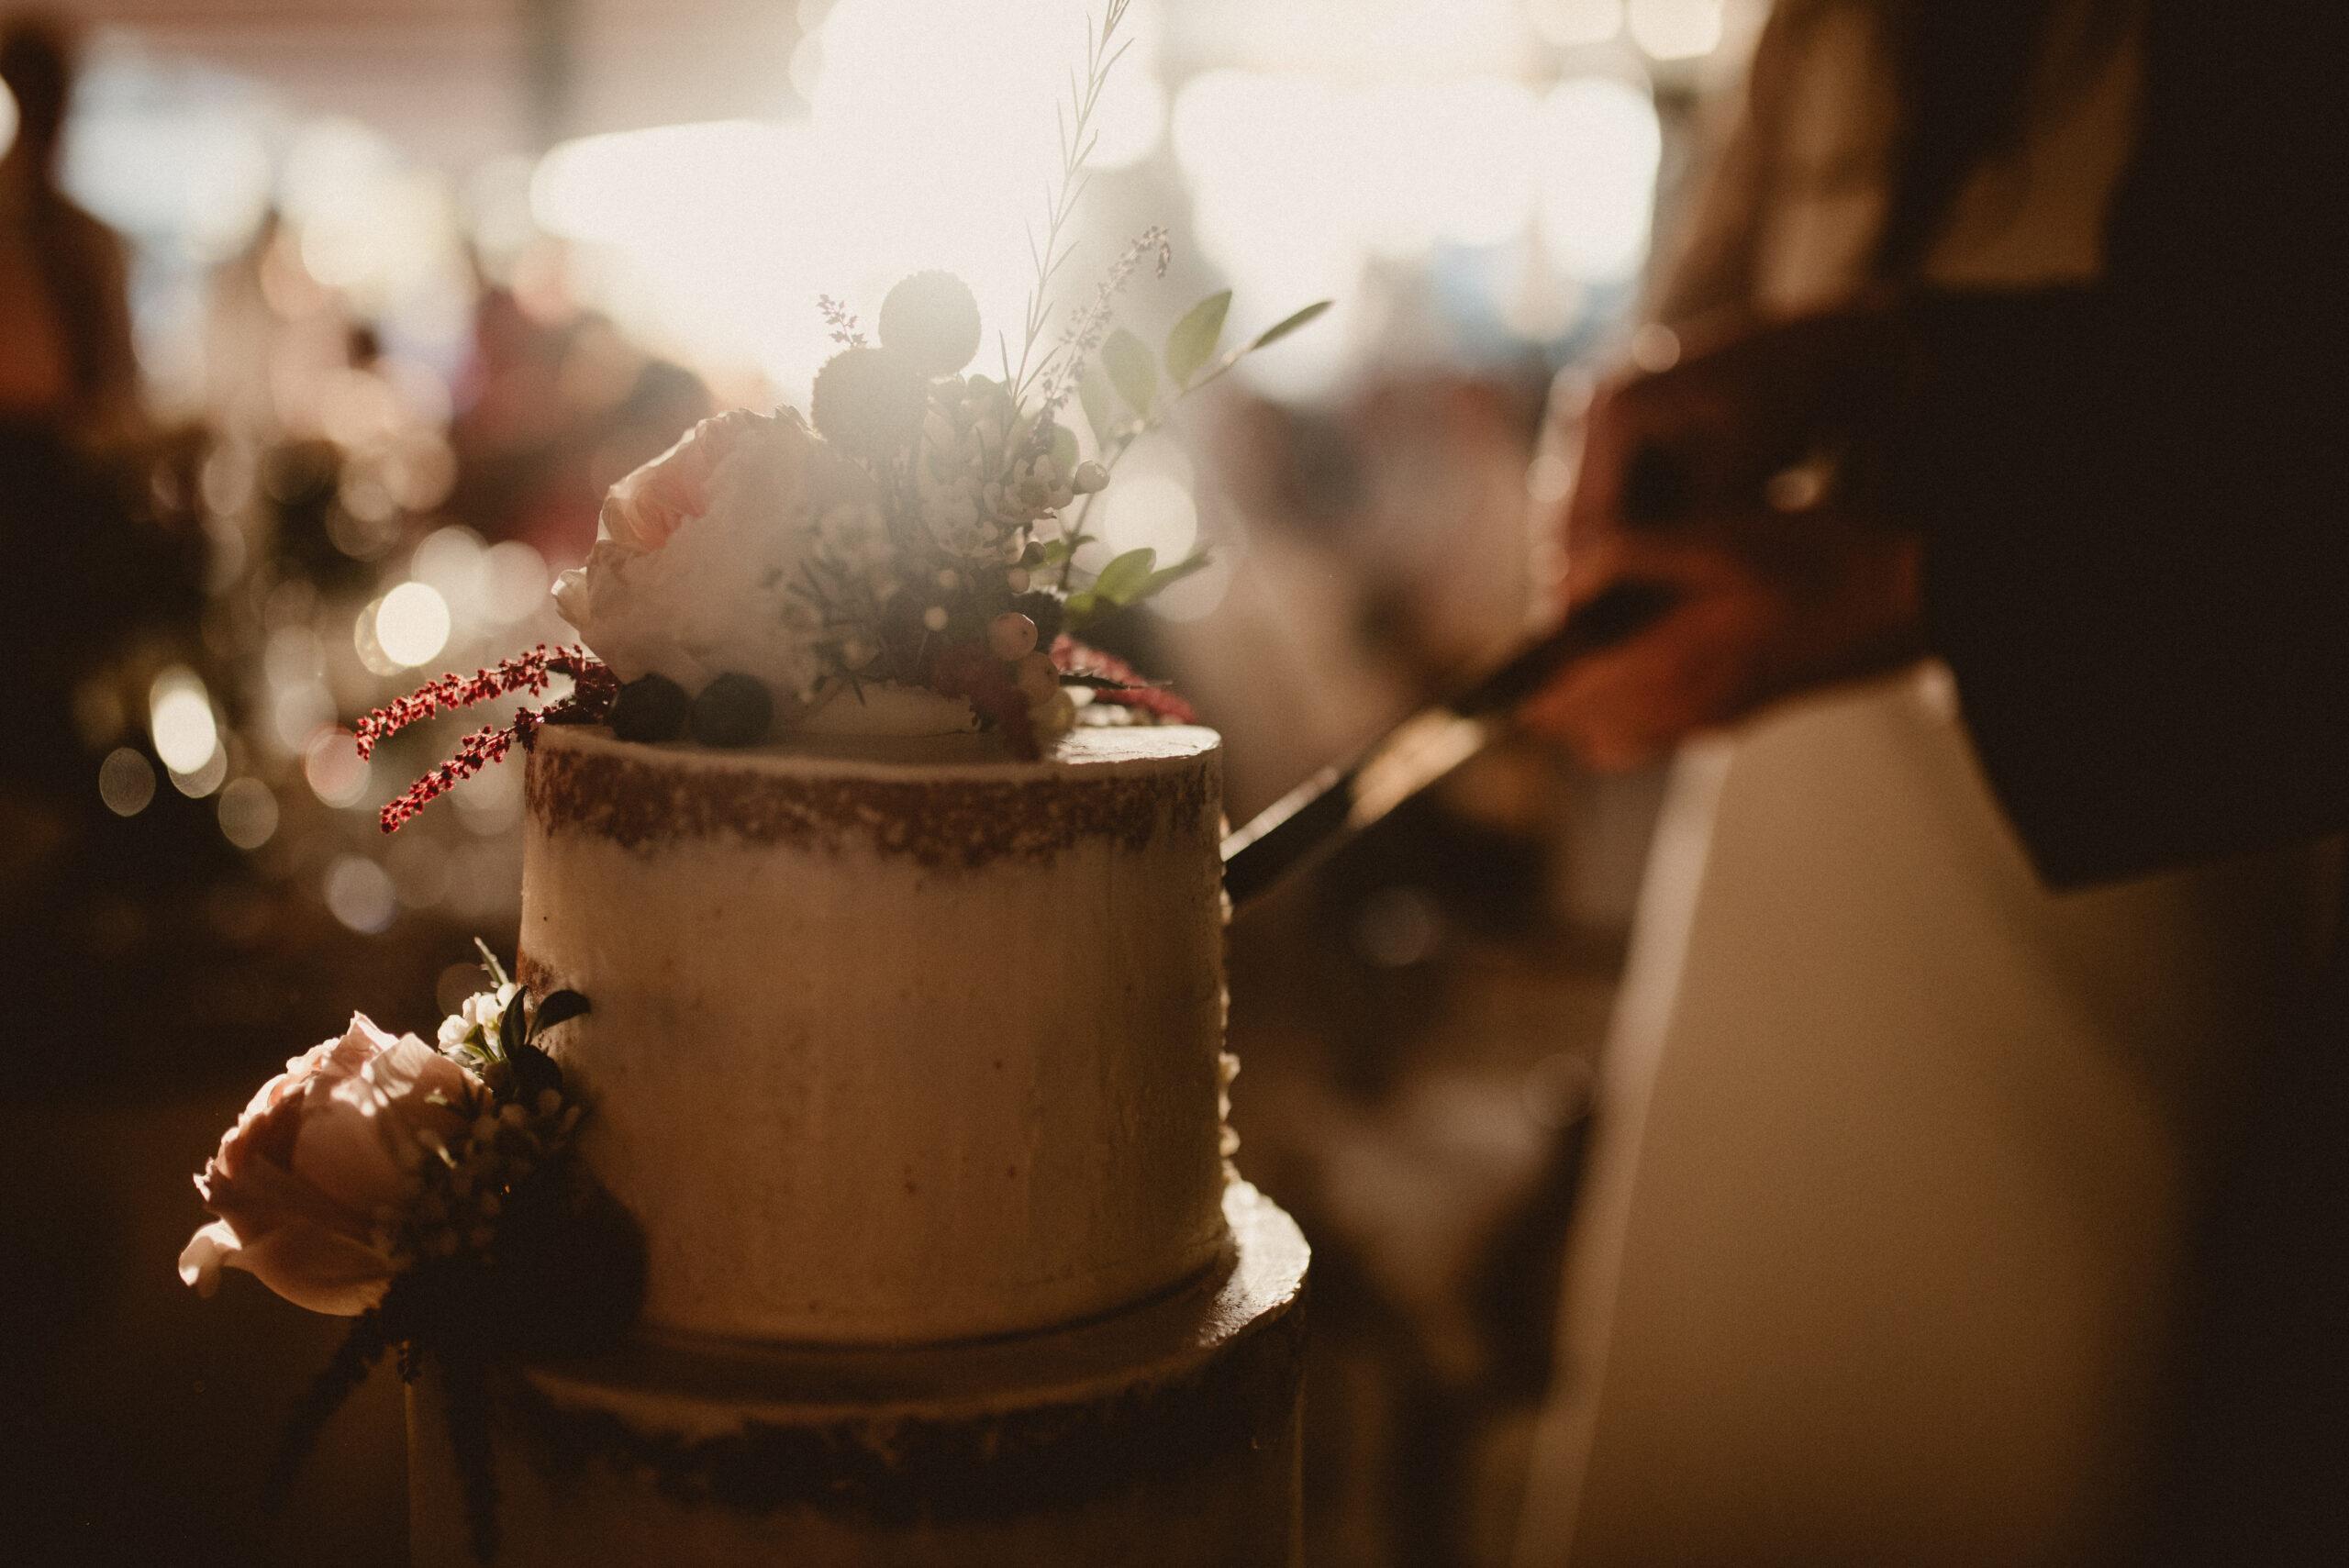 Trozo de tarta de boda